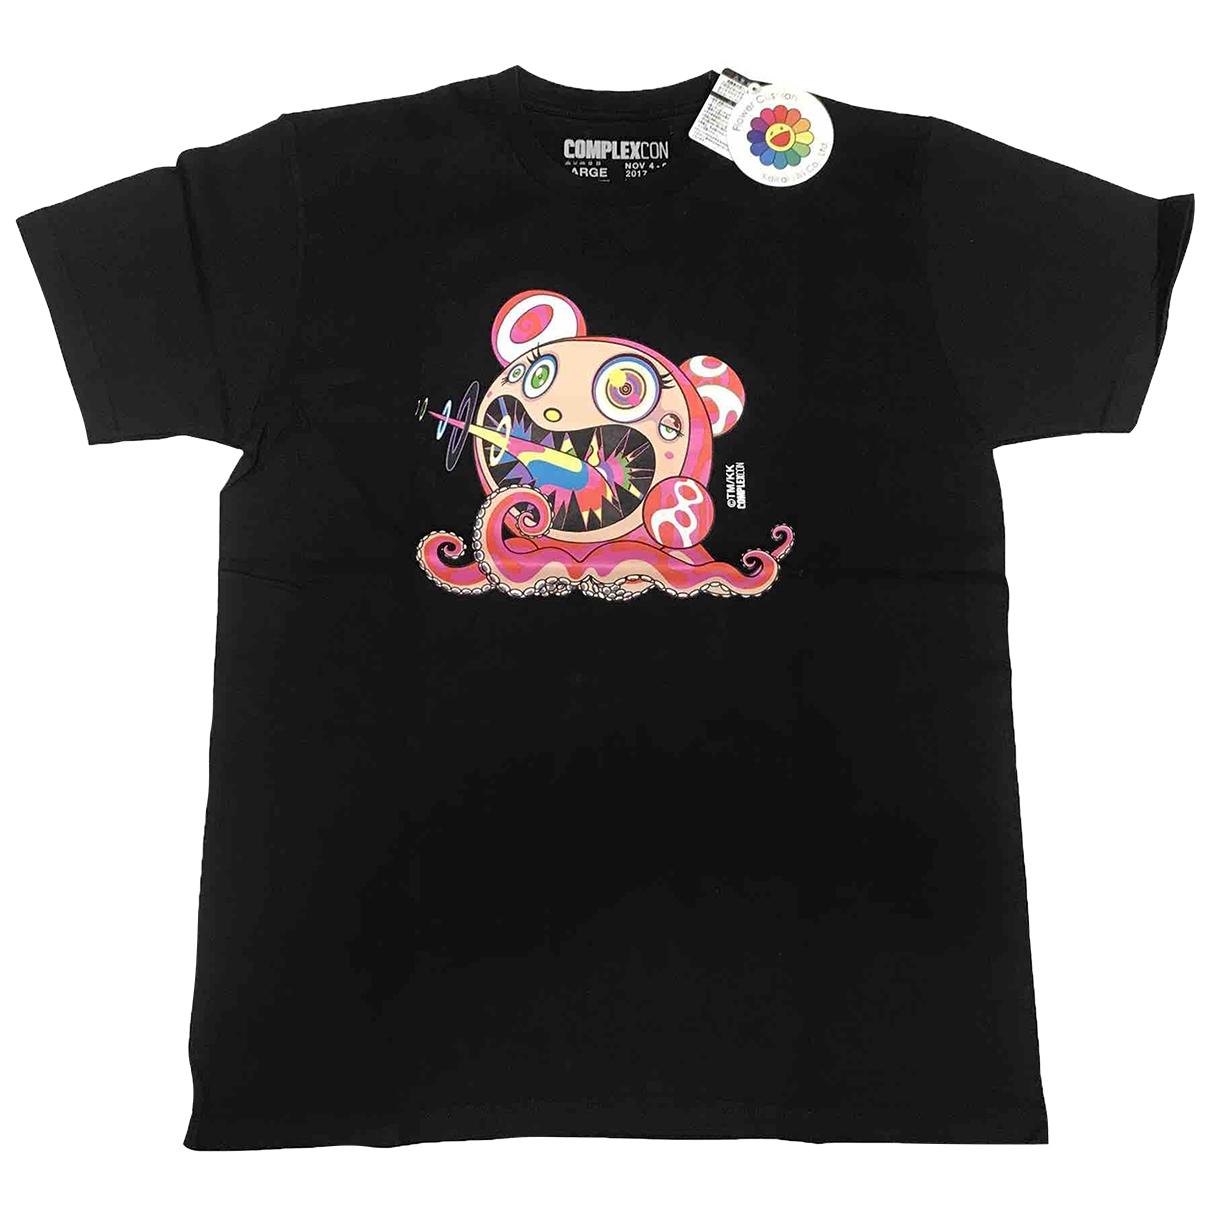 Camiseta Takashi Murakami